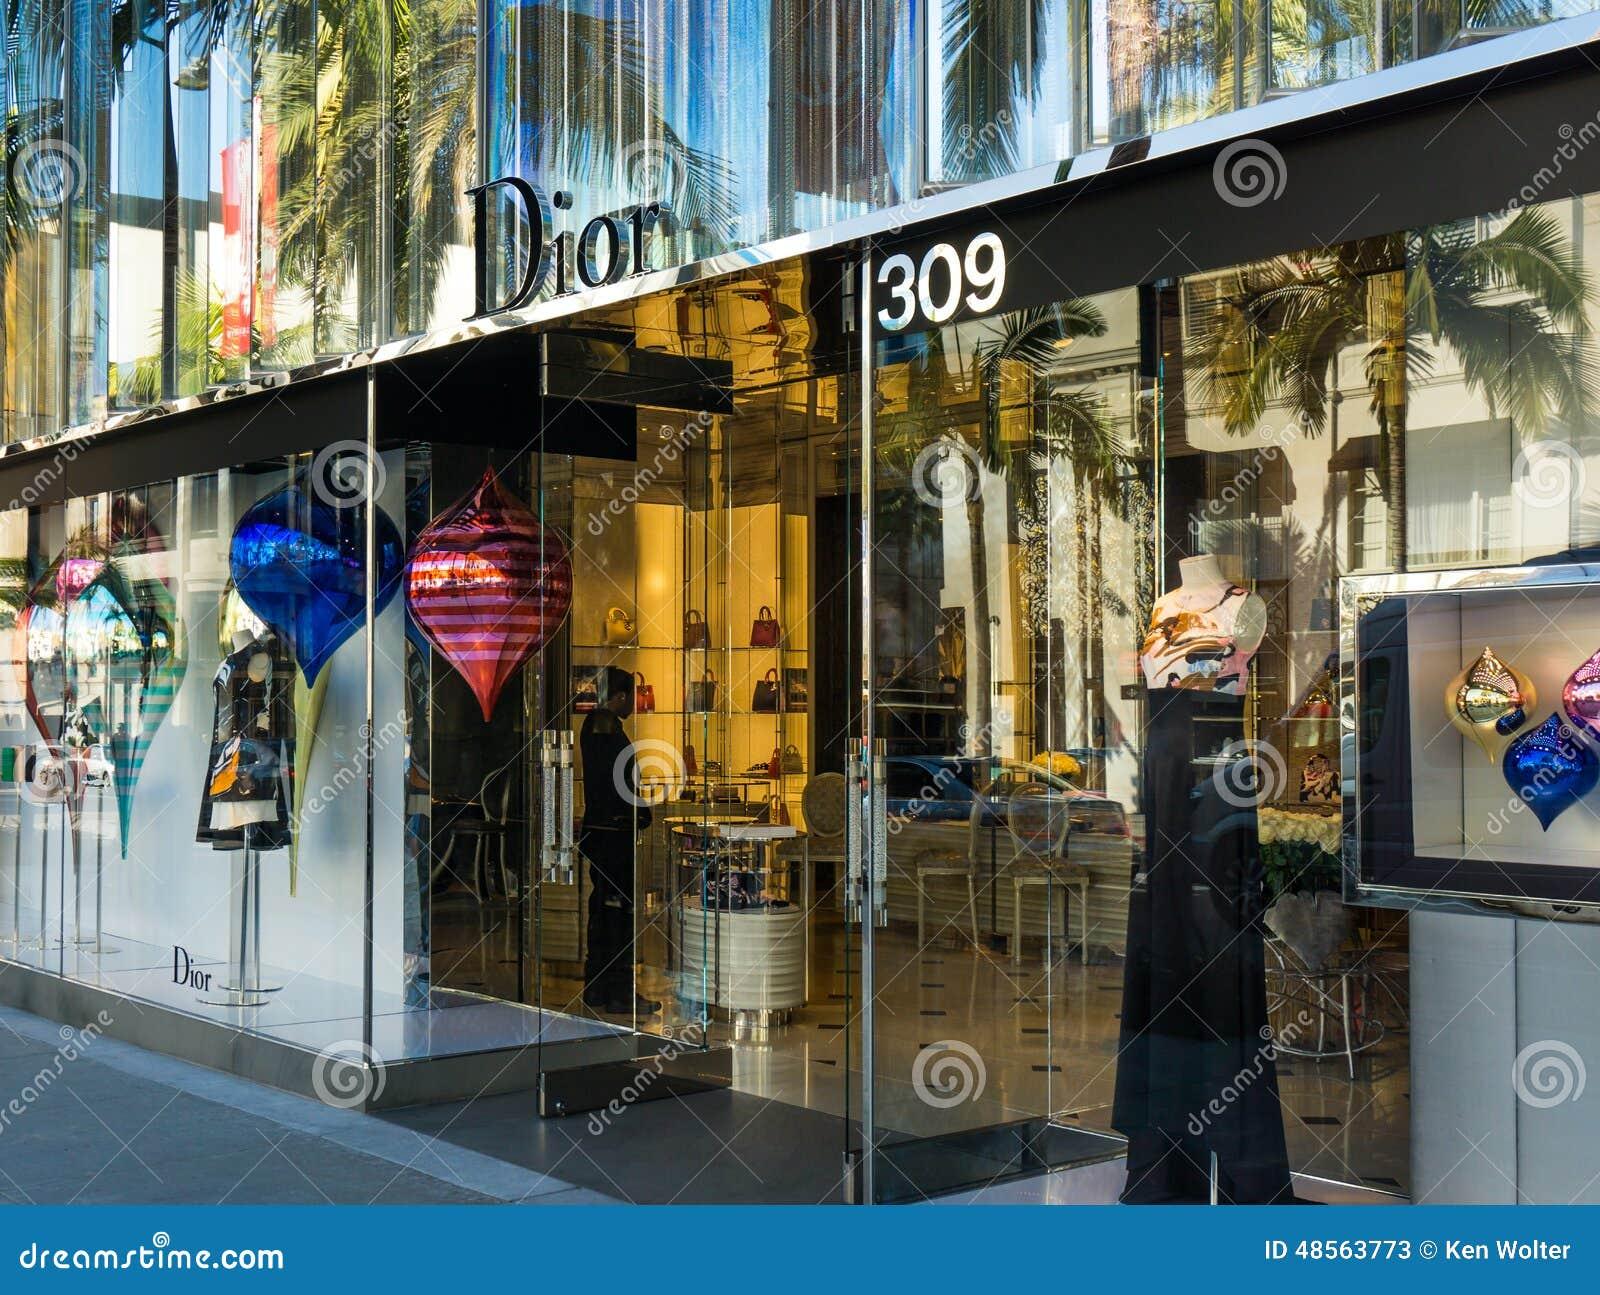 Christian Dior Retail Store Exterior